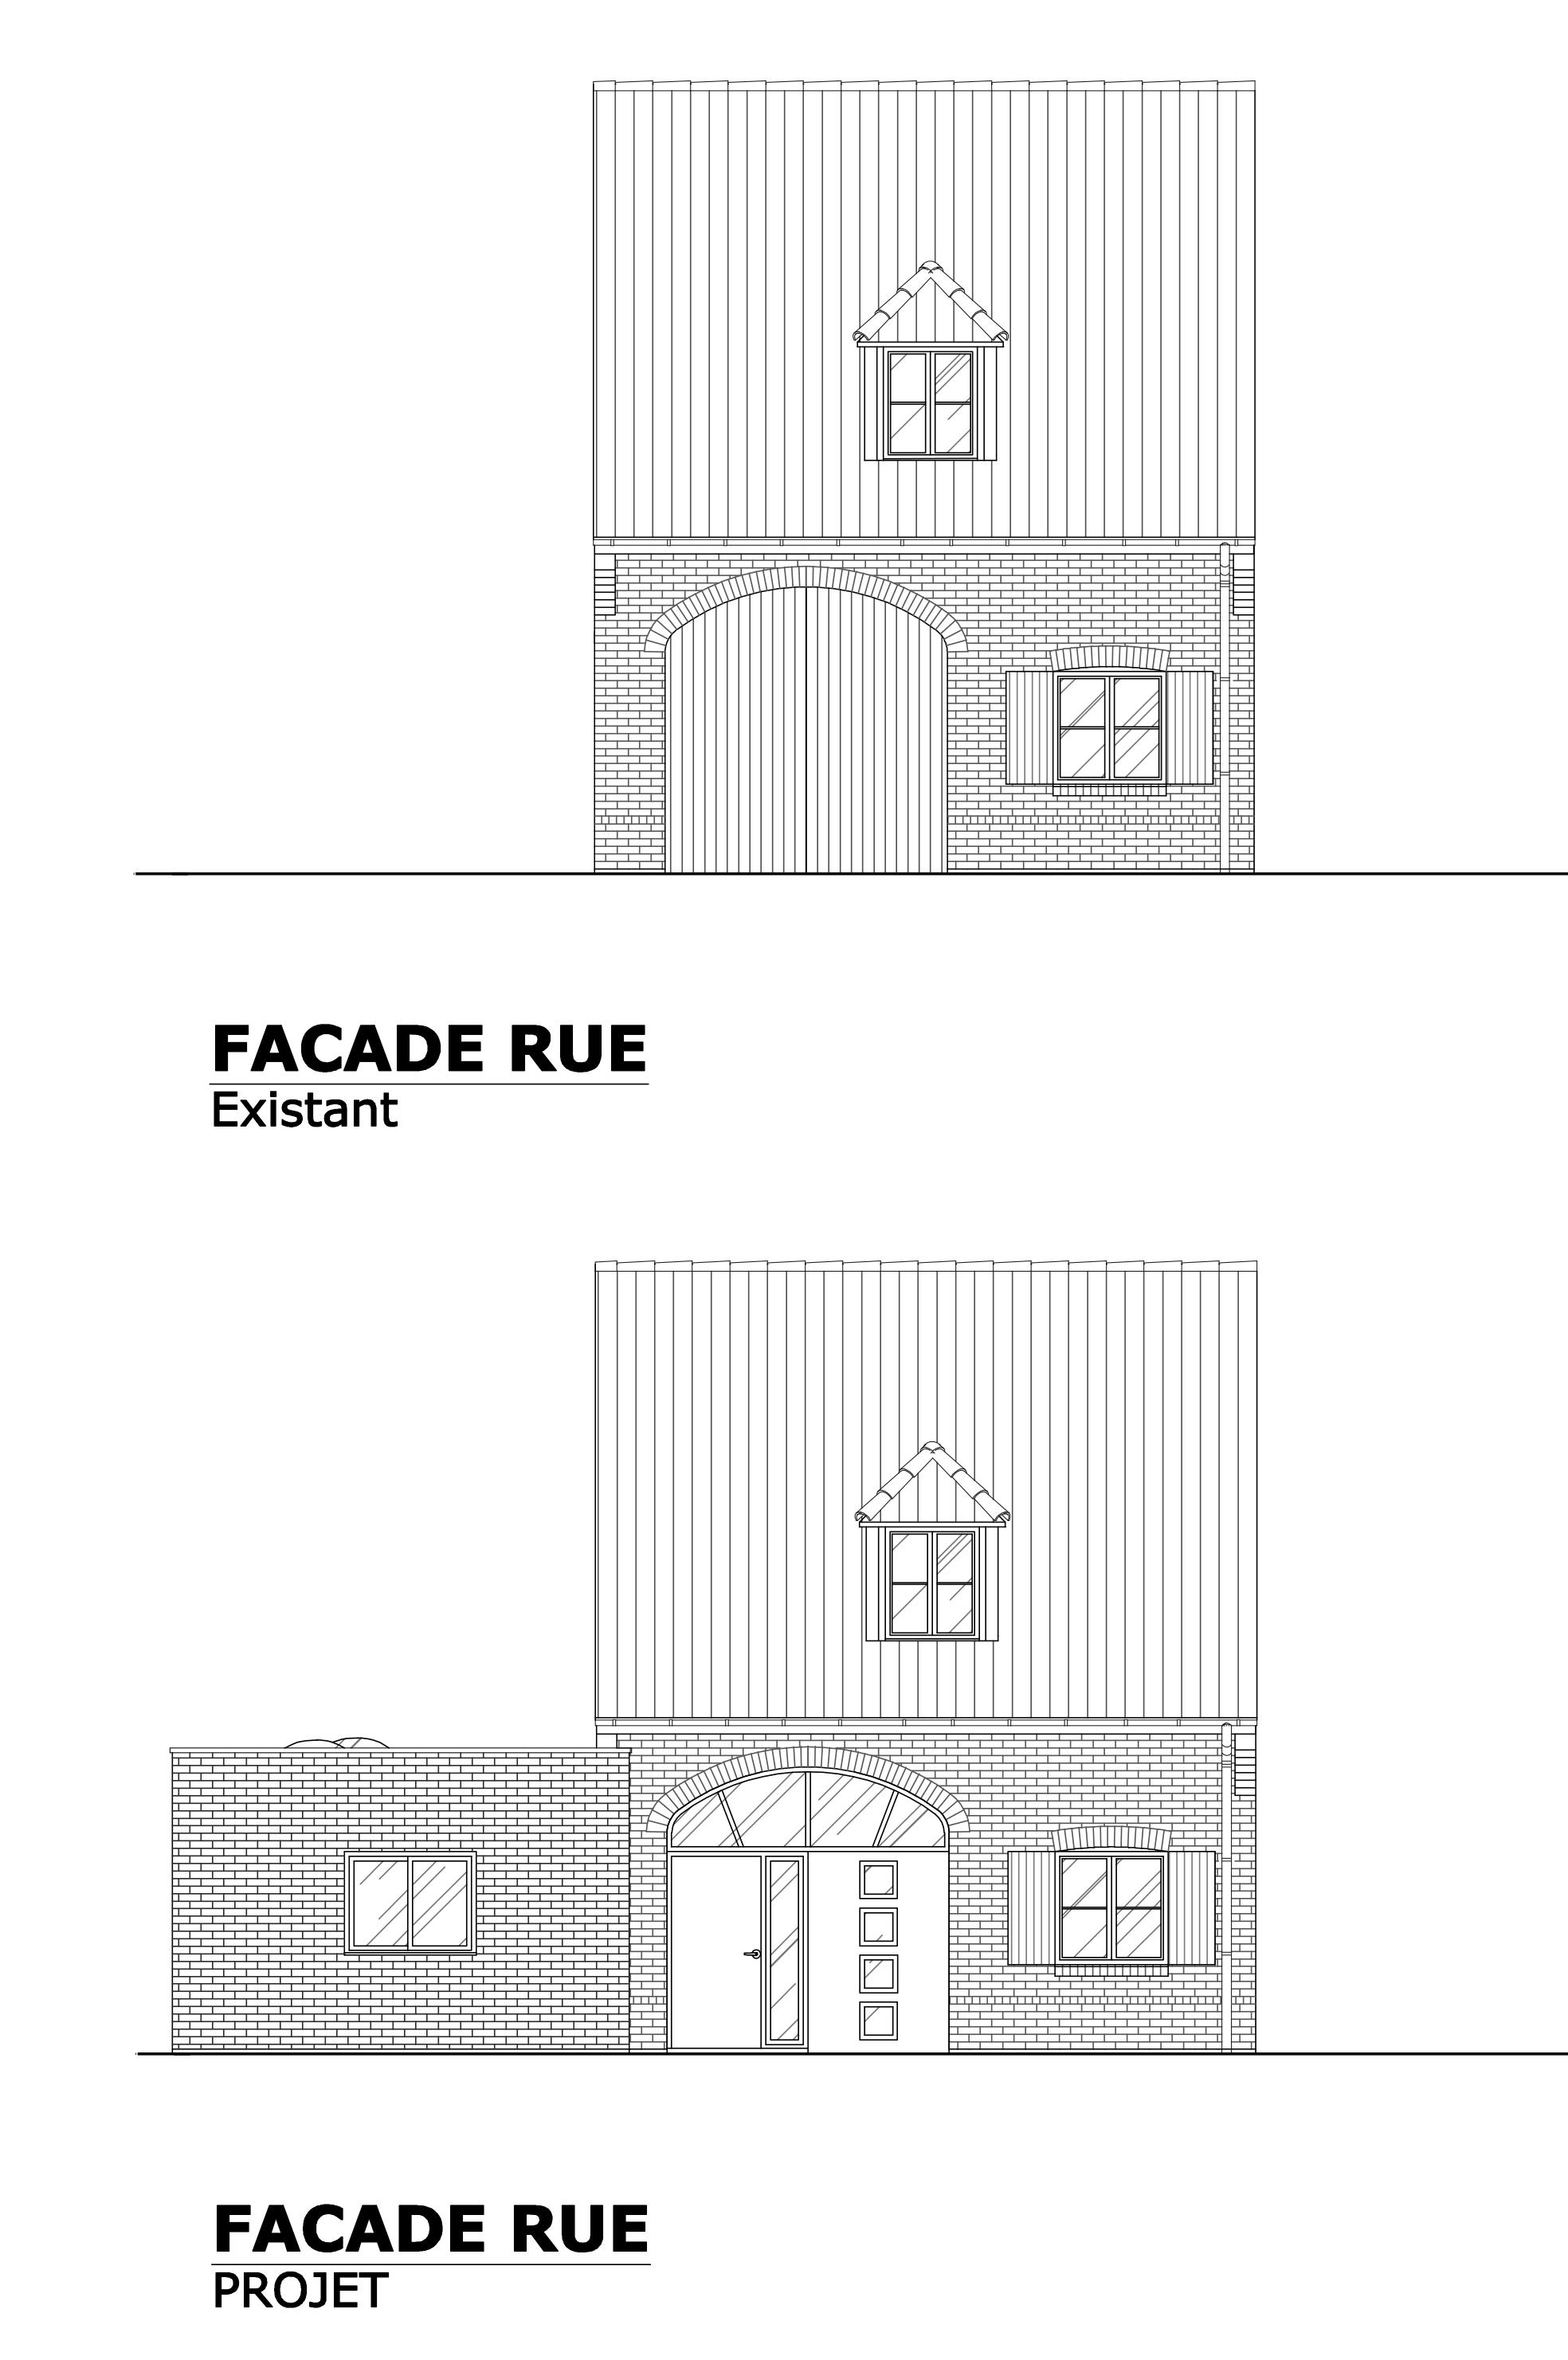 transformation d 39 un garage en habitation avec cr ation d 39 une extension verlinghem. Black Bedroom Furniture Sets. Home Design Ideas